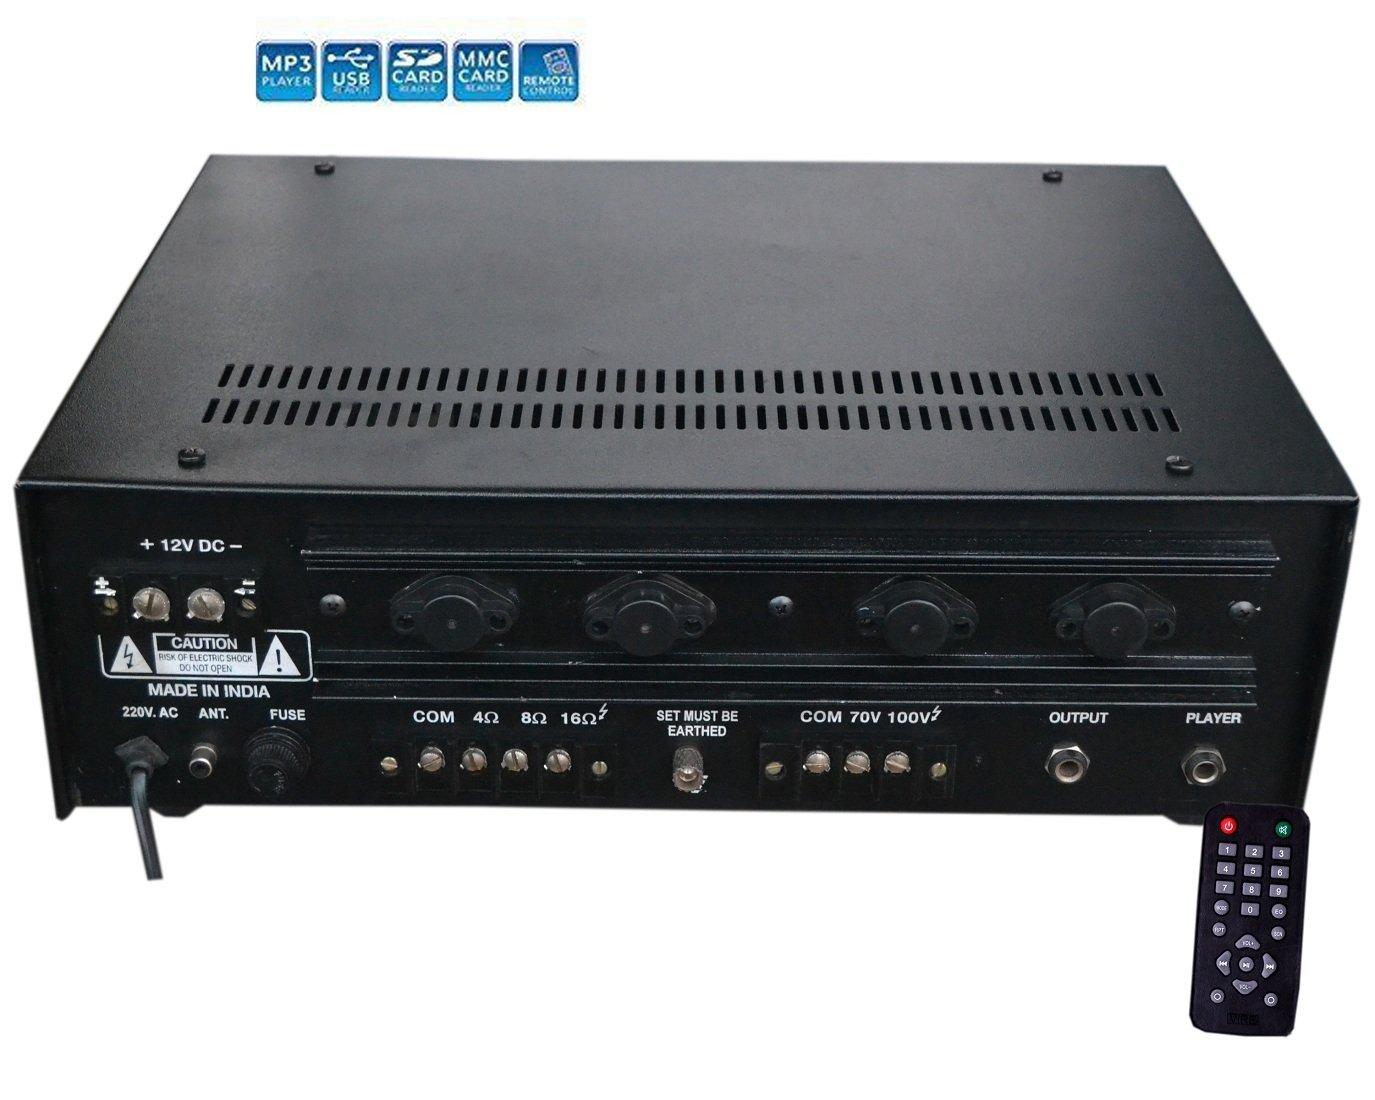 Medha Dj Plus Professional 160 Watt Power Amplifier With Digital Am Modulator And 50w Rf Output Stage Media Plaer Musical Instruments